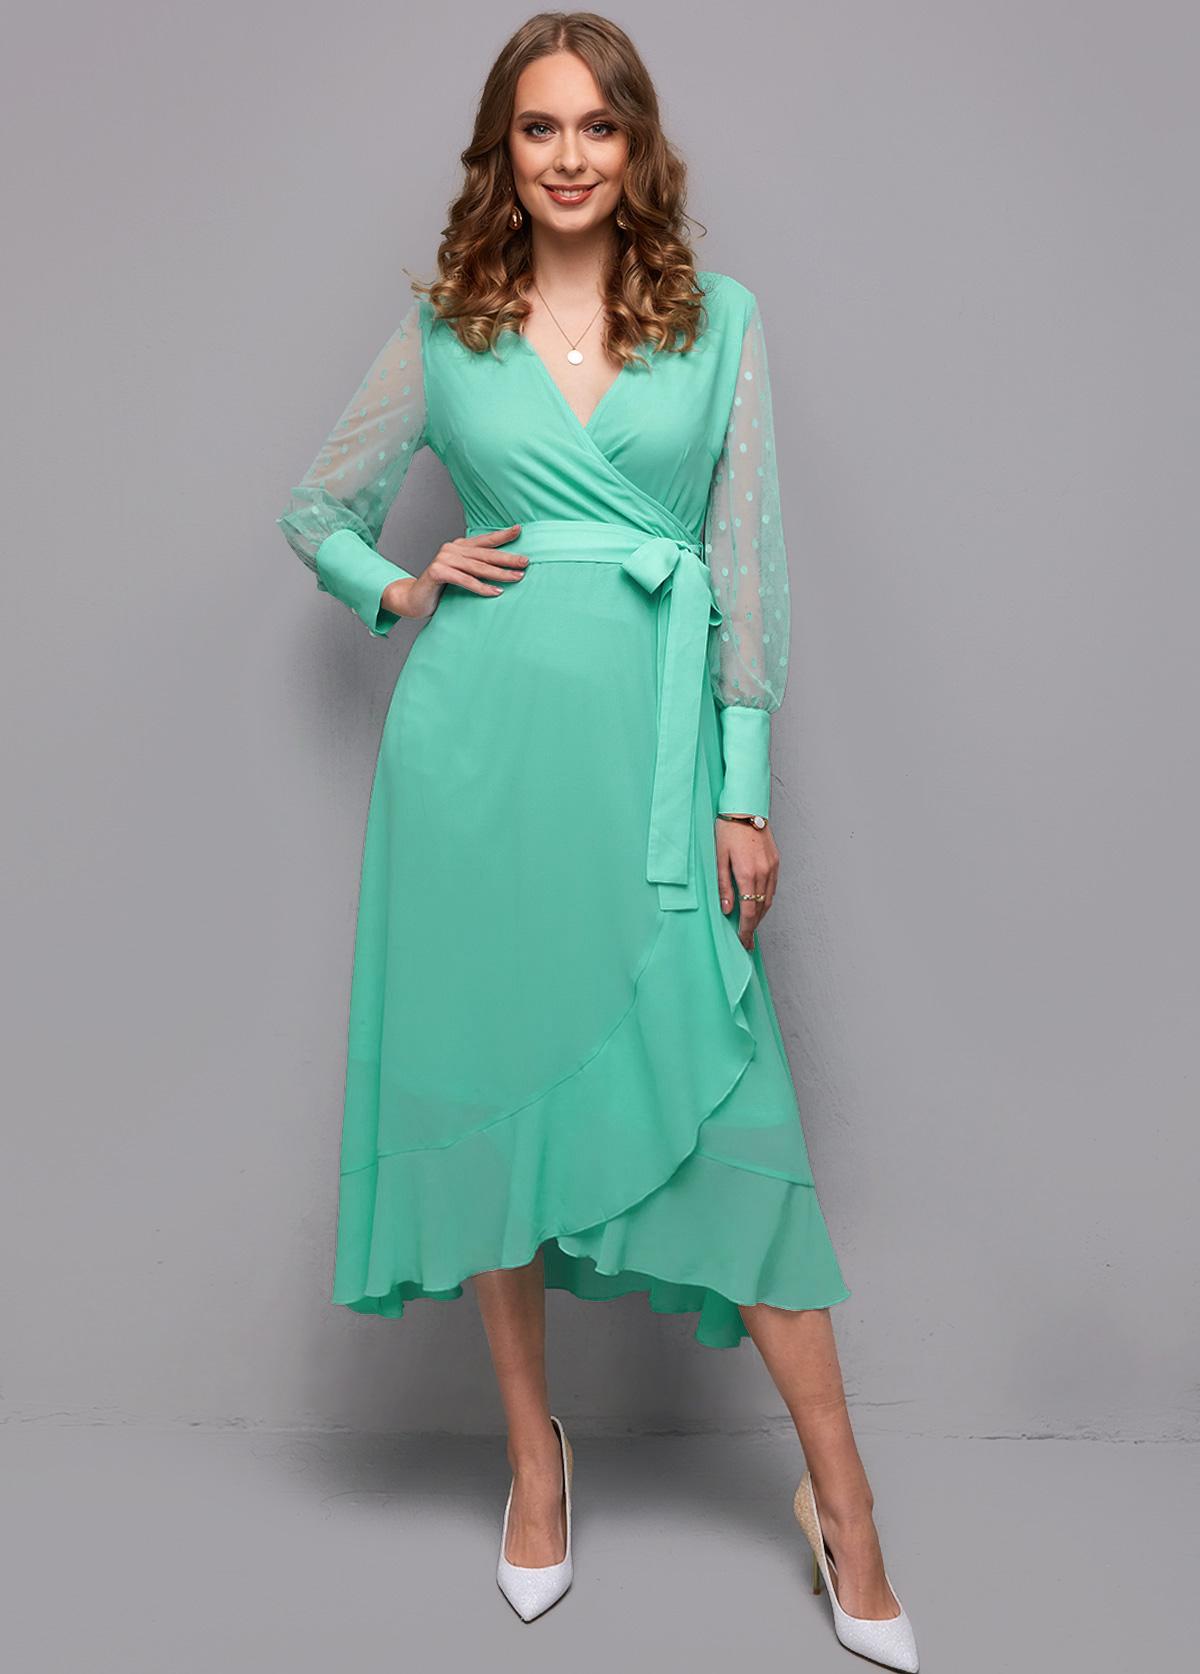 Belted Mesh Stitching Flounce Wrap Dress